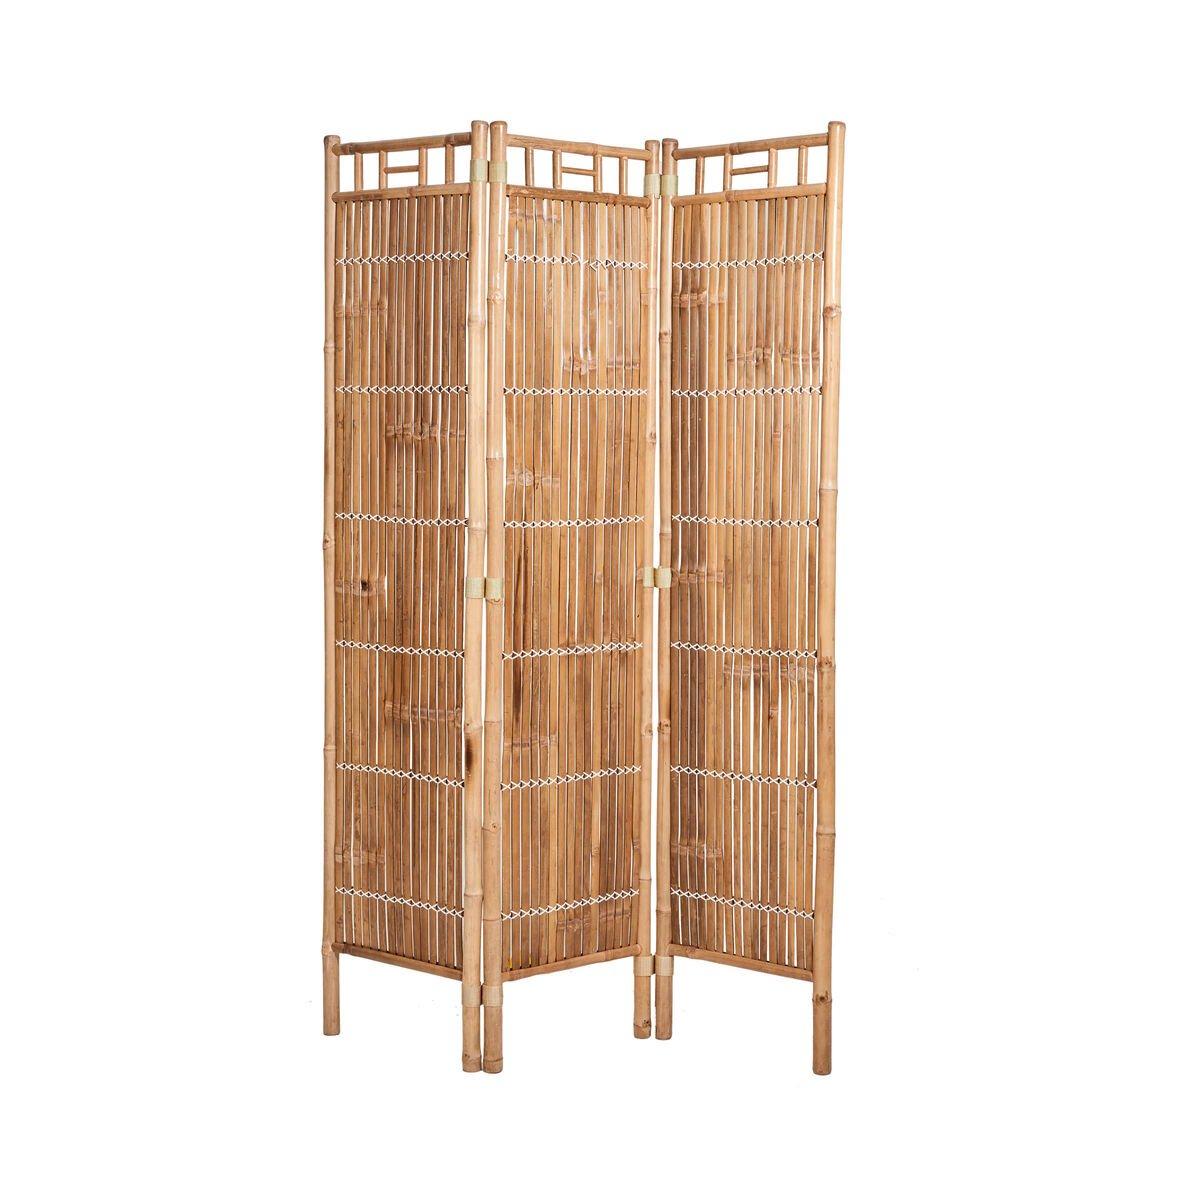 Full Size of Paravent Bambus Balkon Garten Bett Wohnzimmer Paravent Bambus Balkon